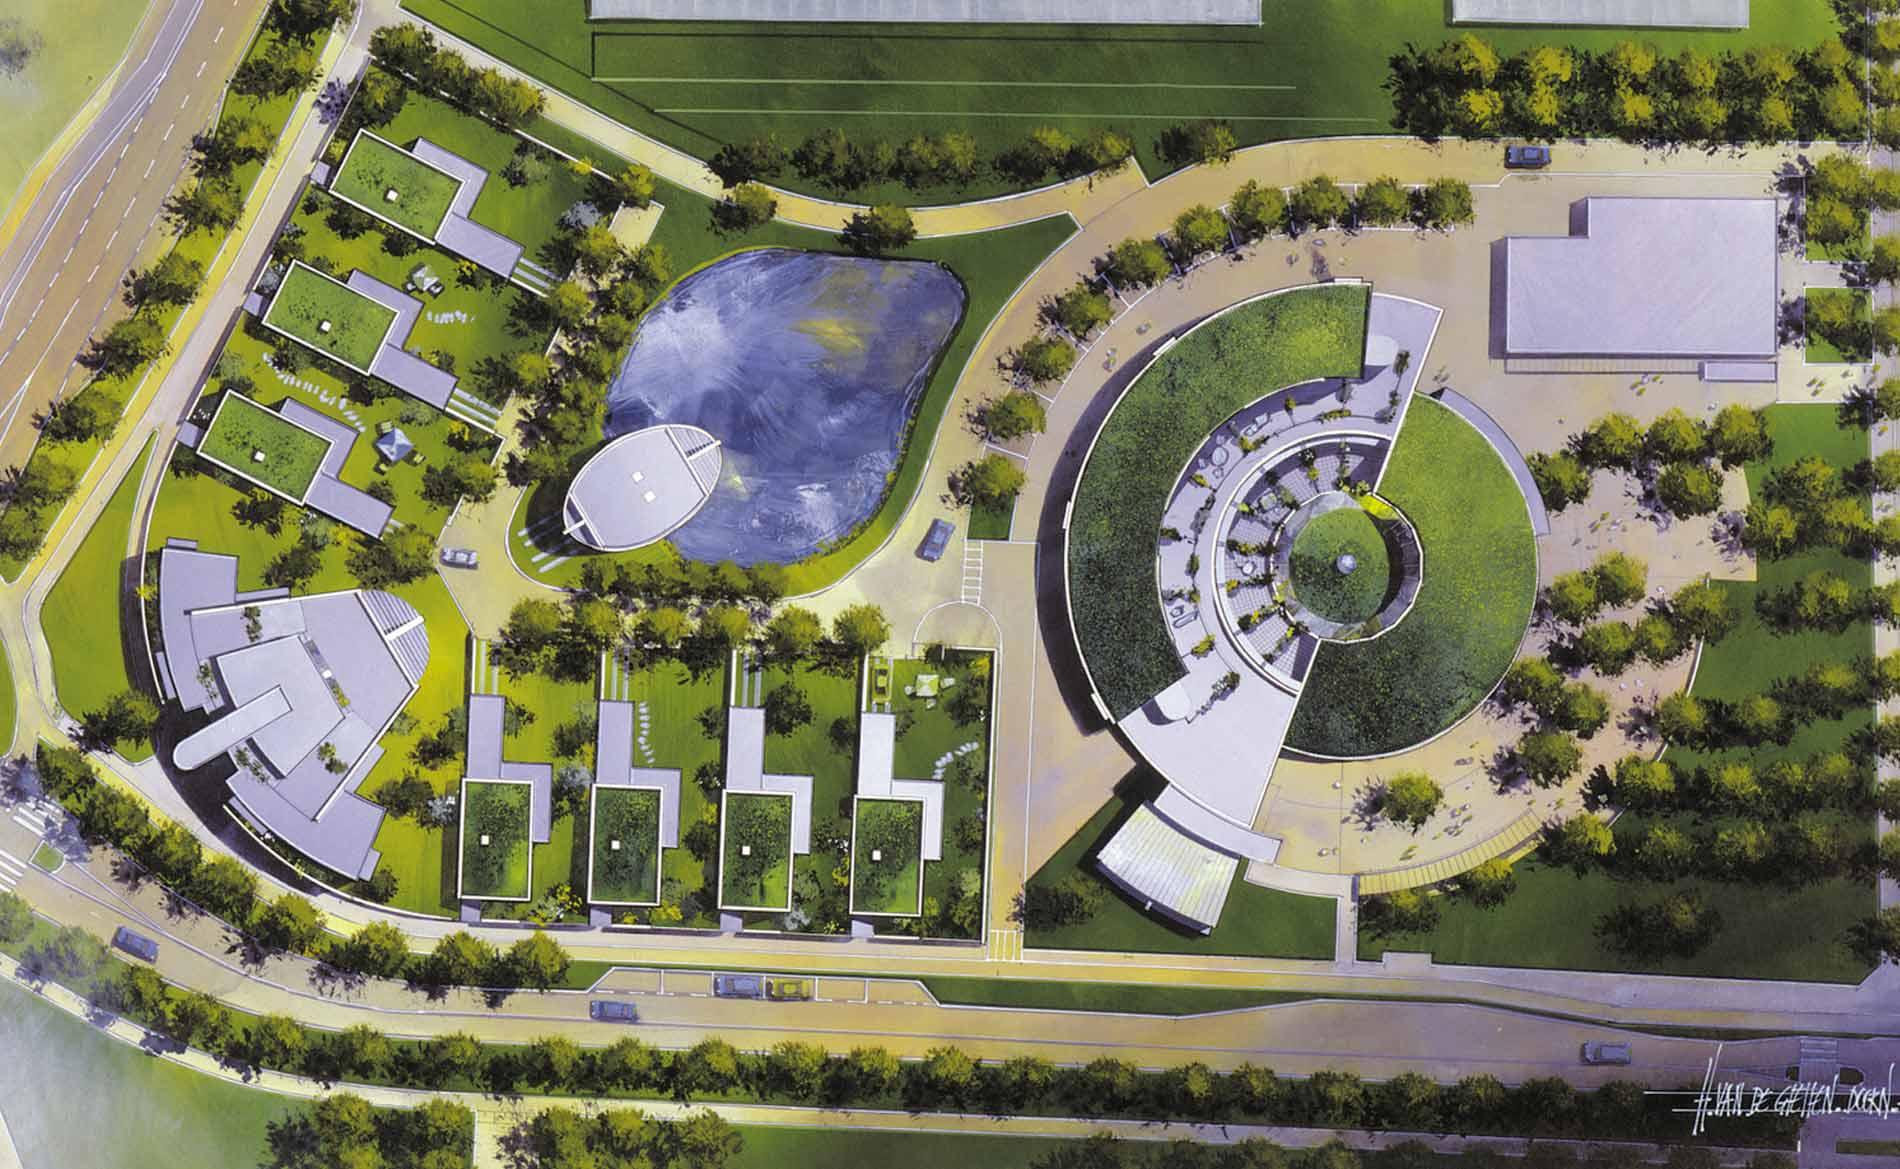 architect duurzaam bouwen Basisschool duurzame school Frisse Scholen Energie 0 Energie nul BBHD architectenSokkerwei Castricum